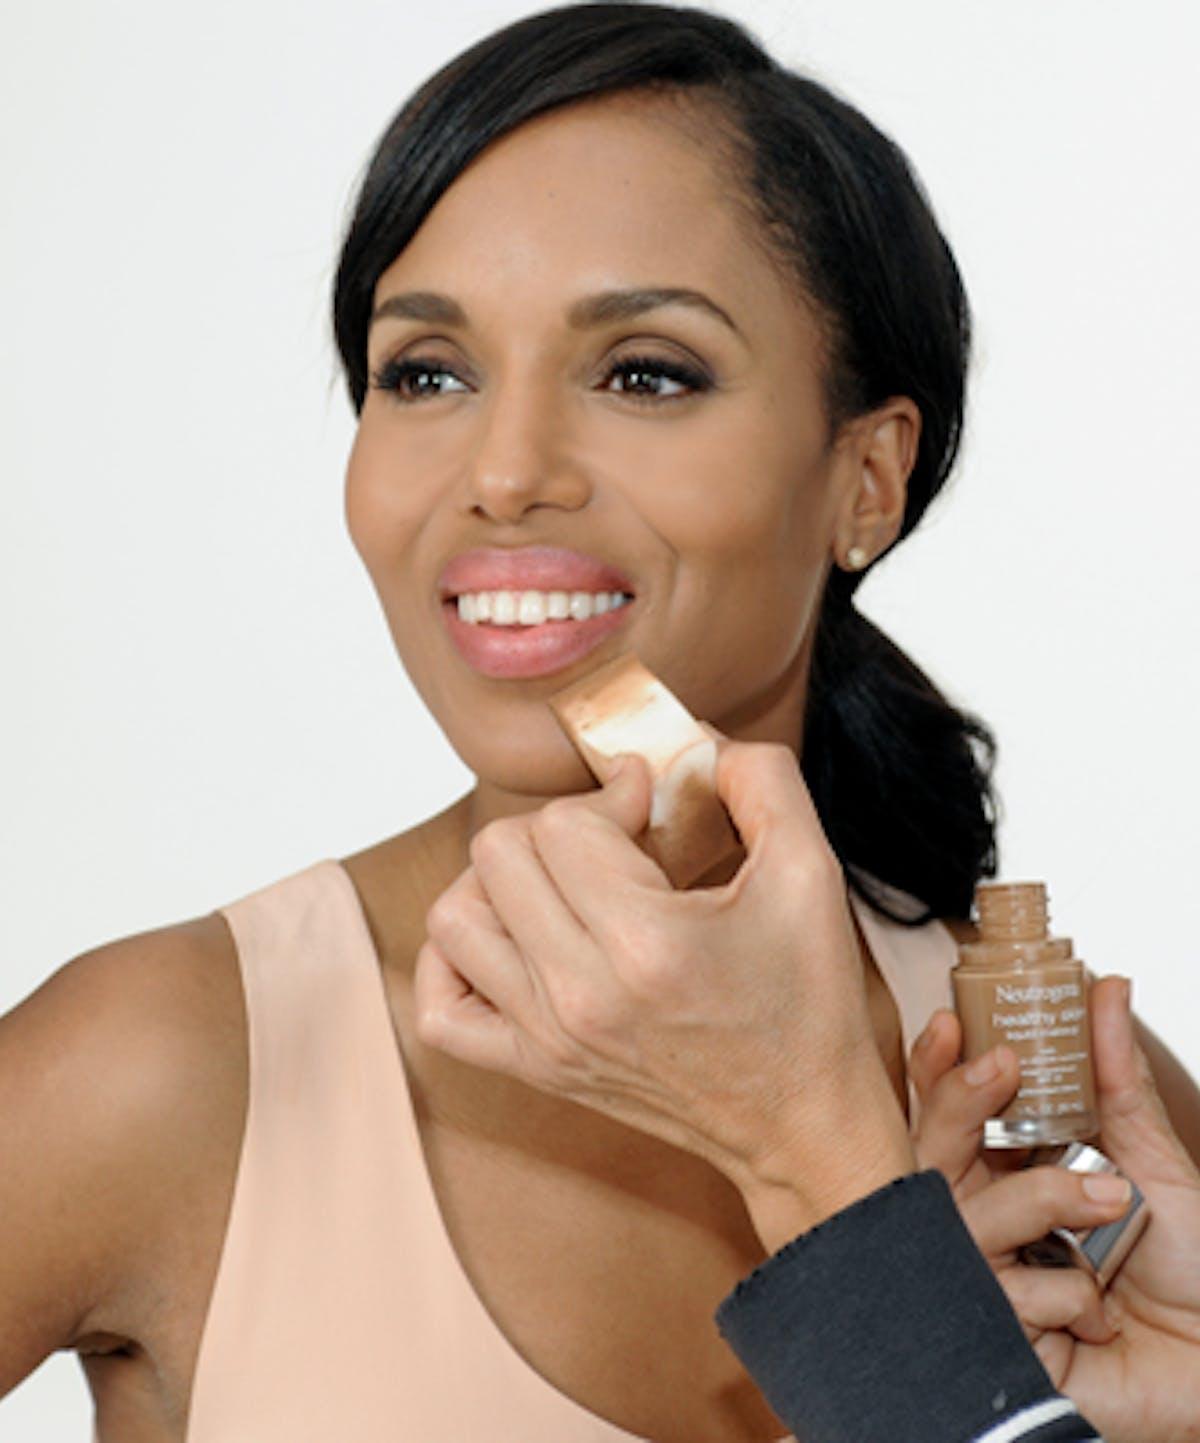 Skin Health: Healthy Skin Liquid Makeup Foundation With SPF